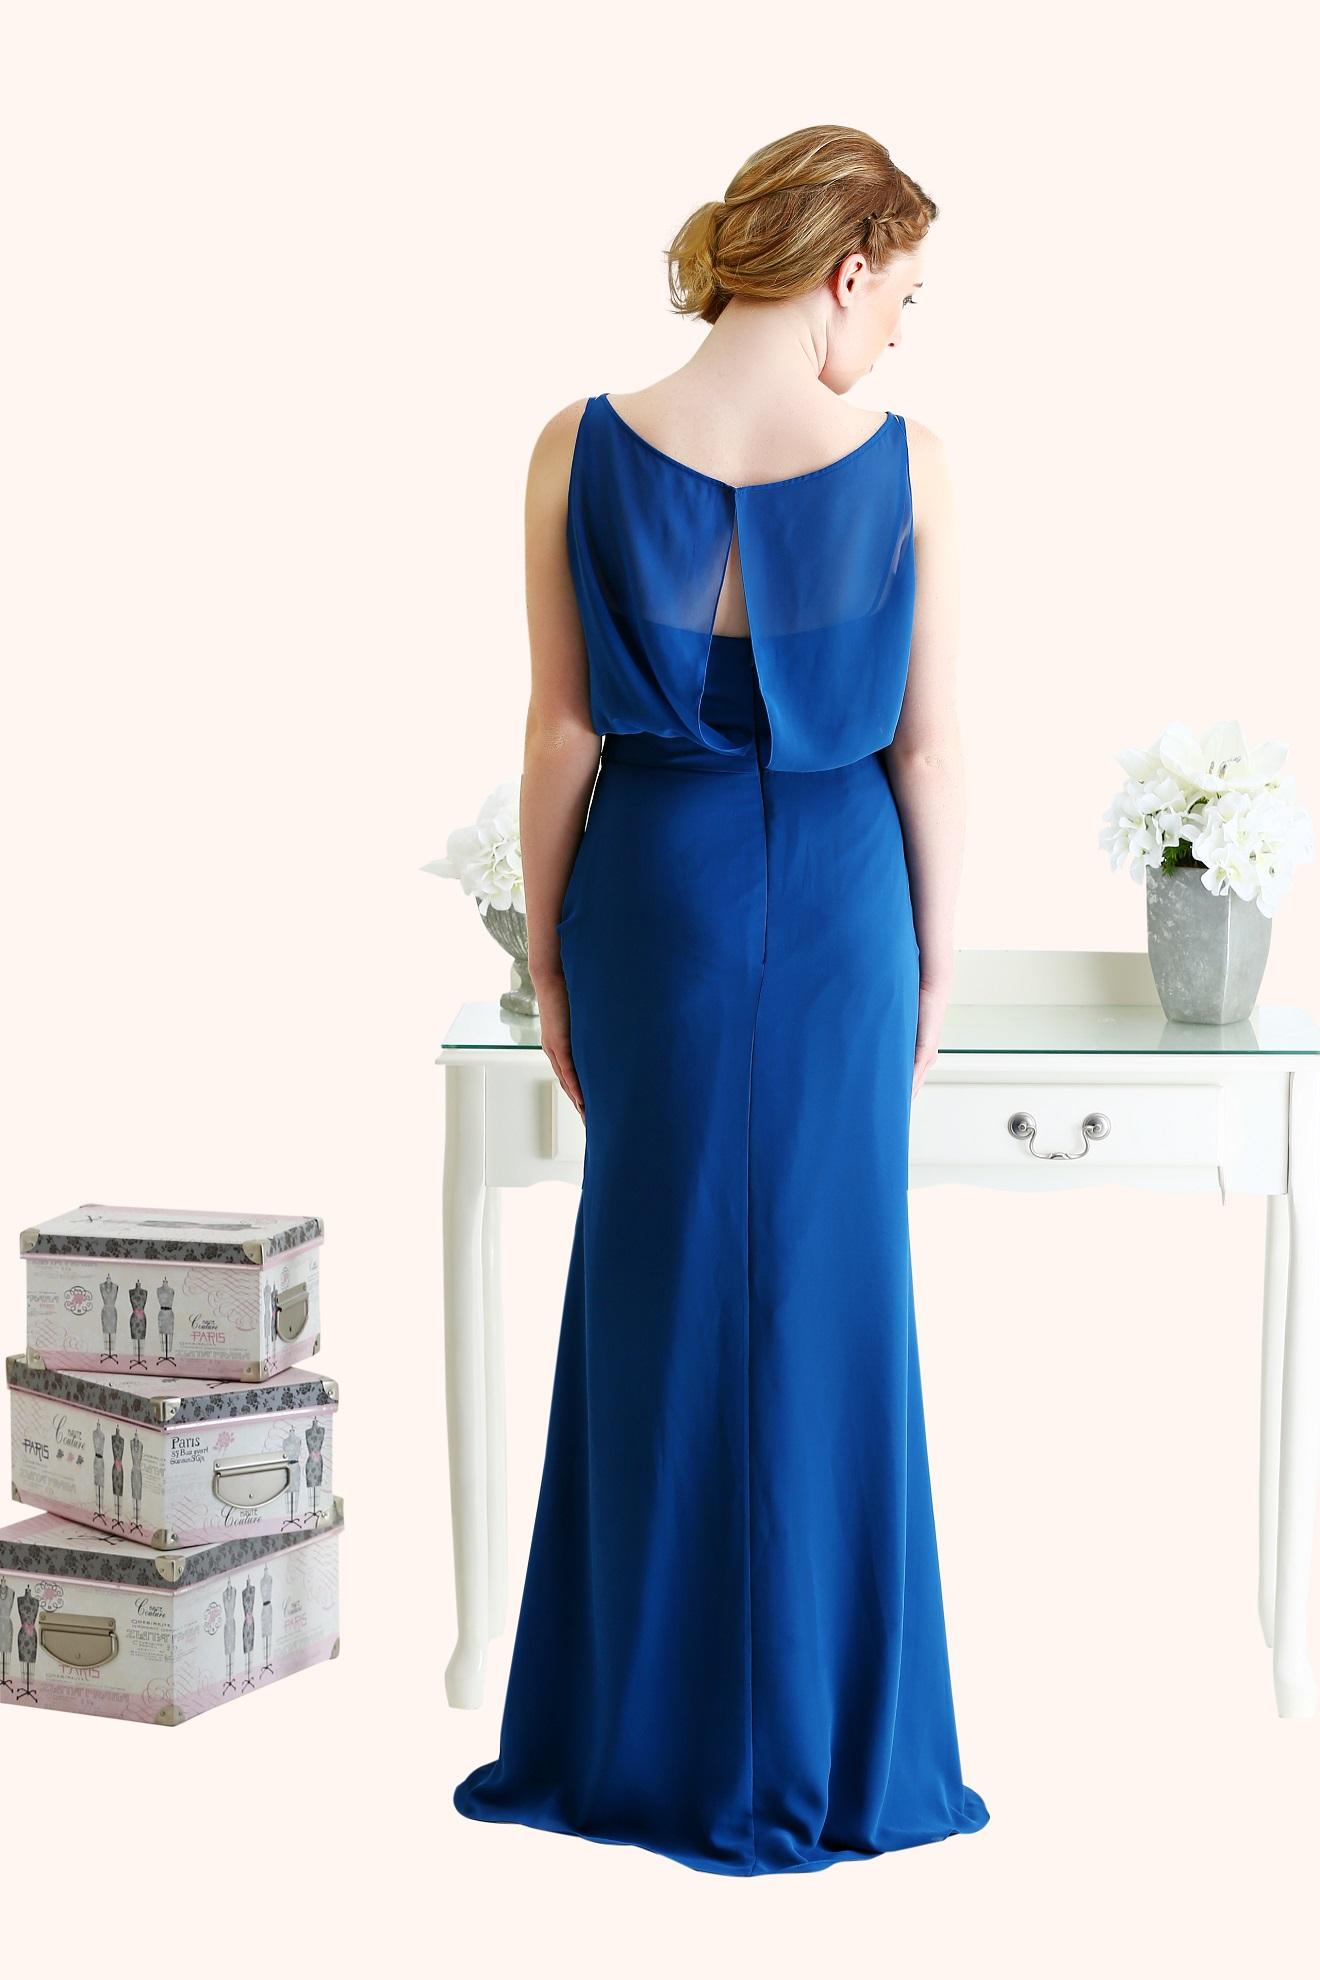 Estilo Moda Milton Keynes Laura Long Length Blue Chiffon A Line Bridesmaid Dress Blousy Bodice